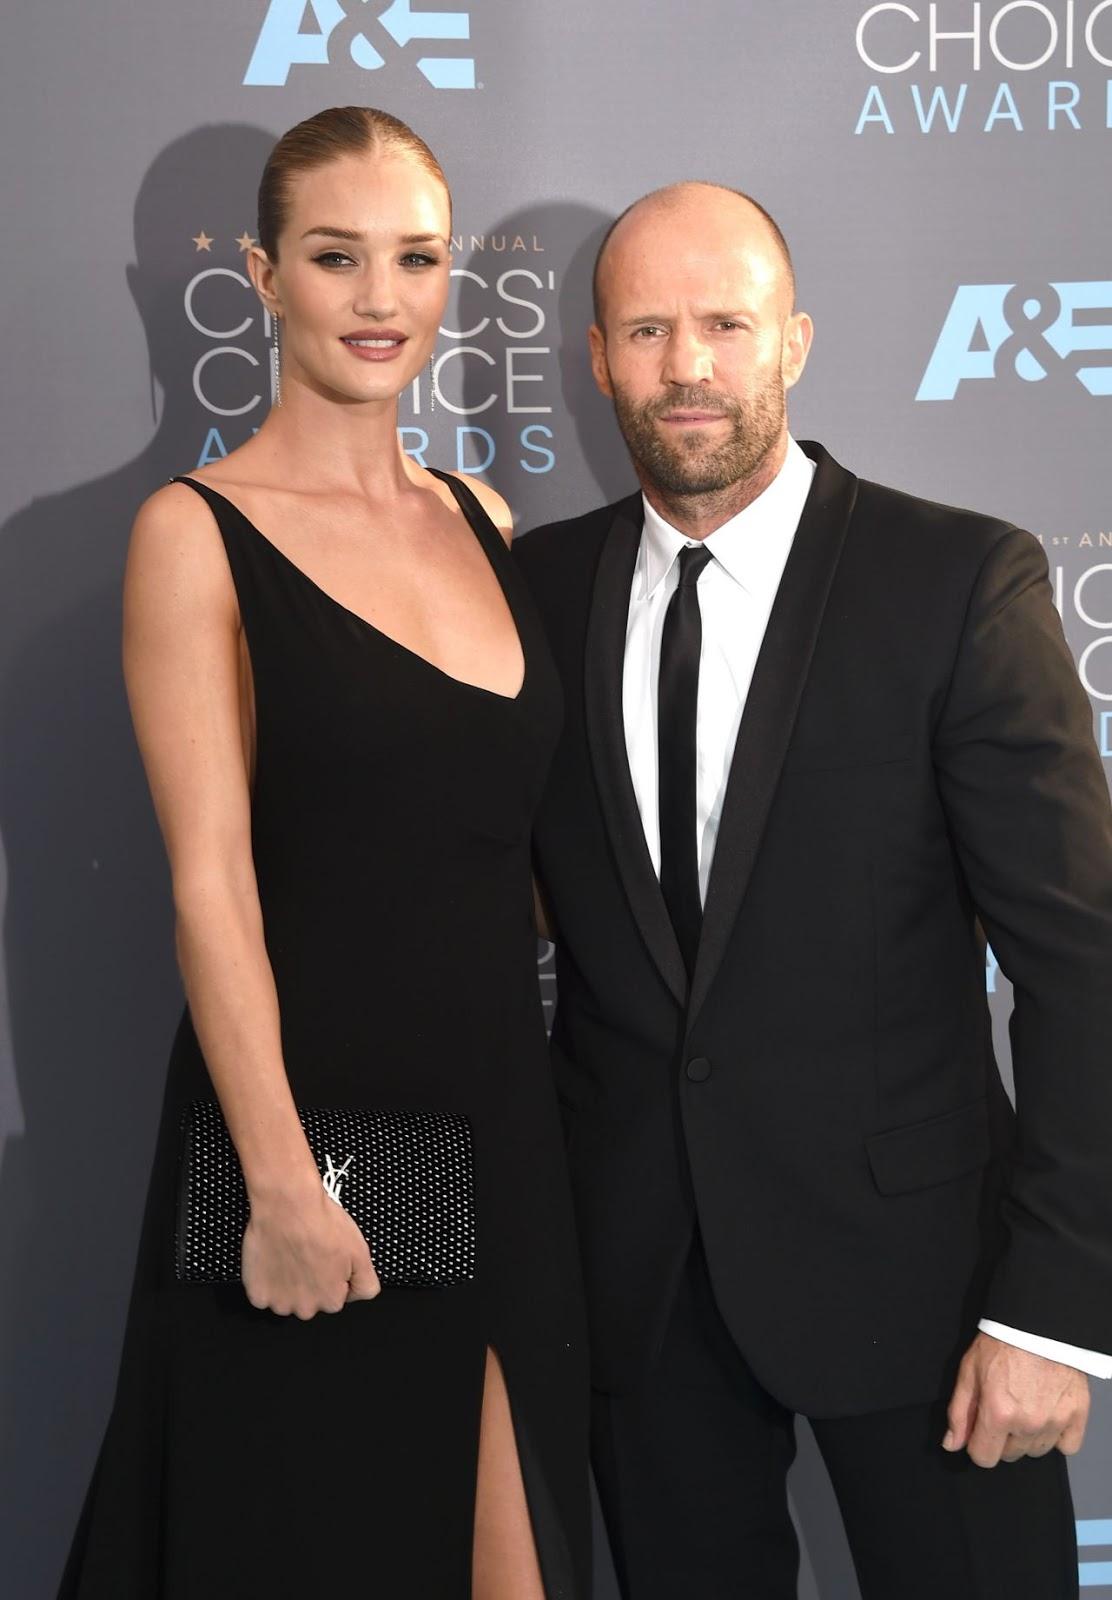 Jason Statham & Rosie Huntington at 2016 Critics Choice Awards